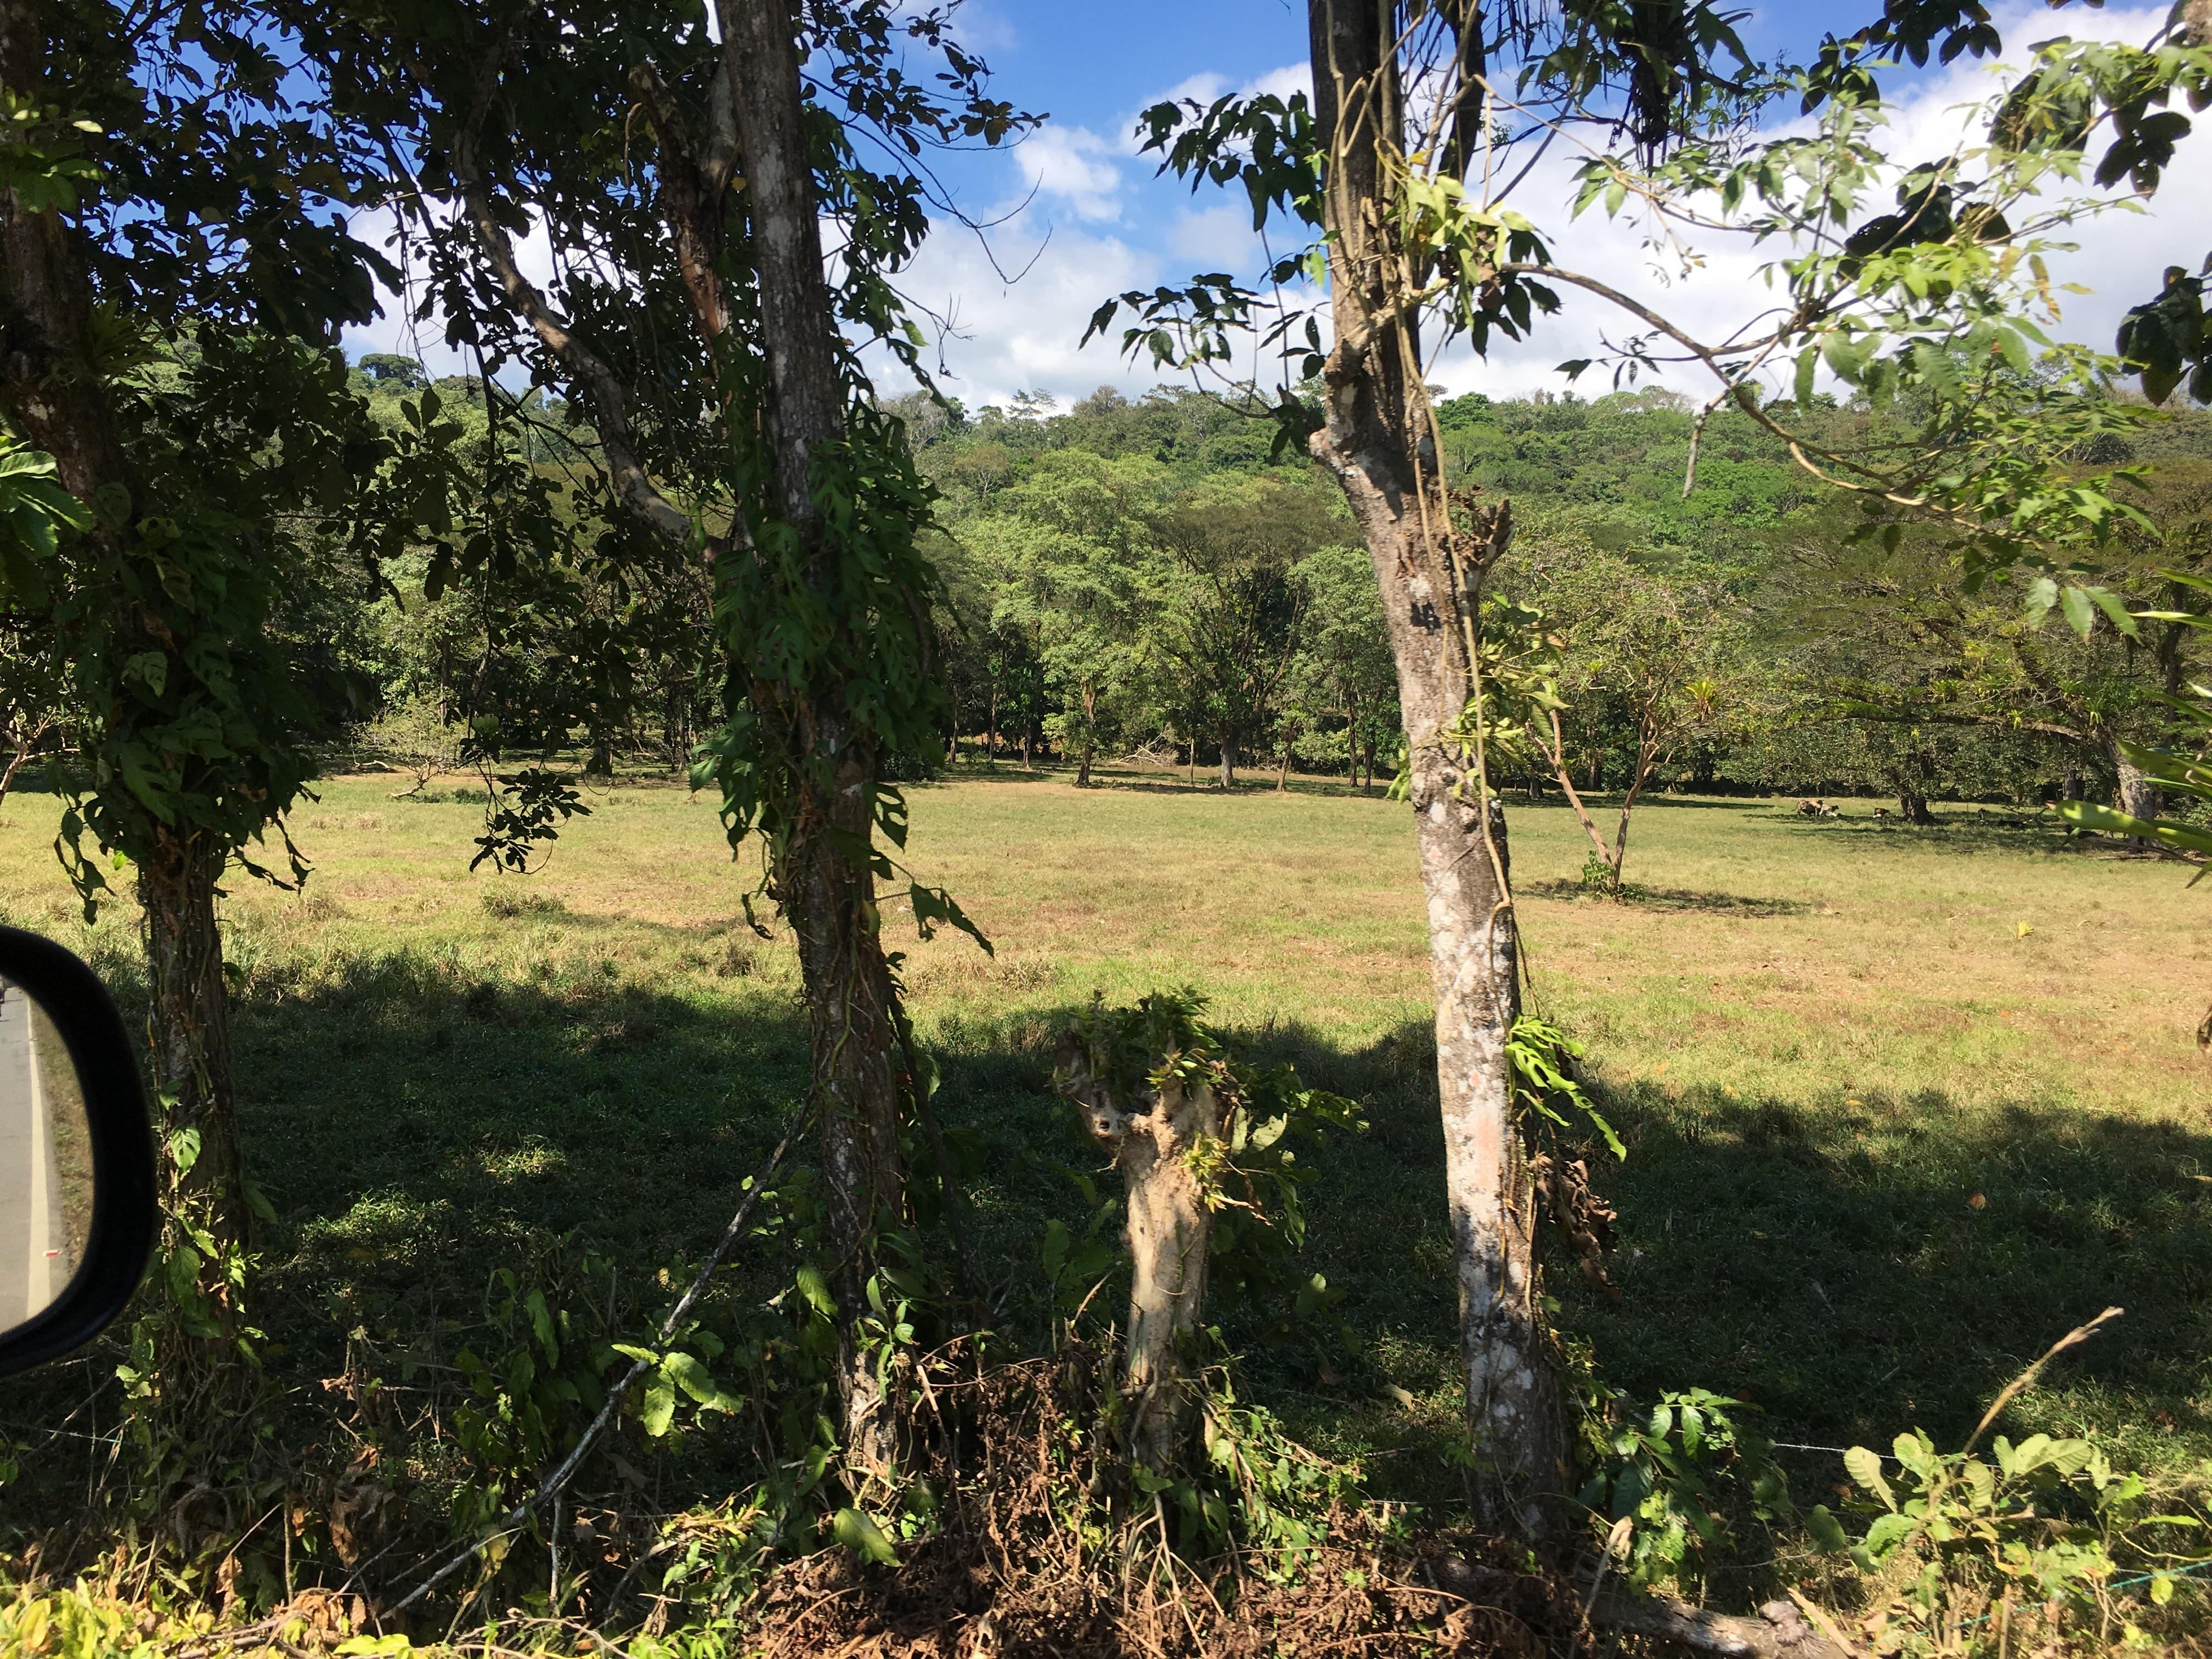 Dominical-Costa-Rica-property-costaricarealestateDOM331-4.jpg